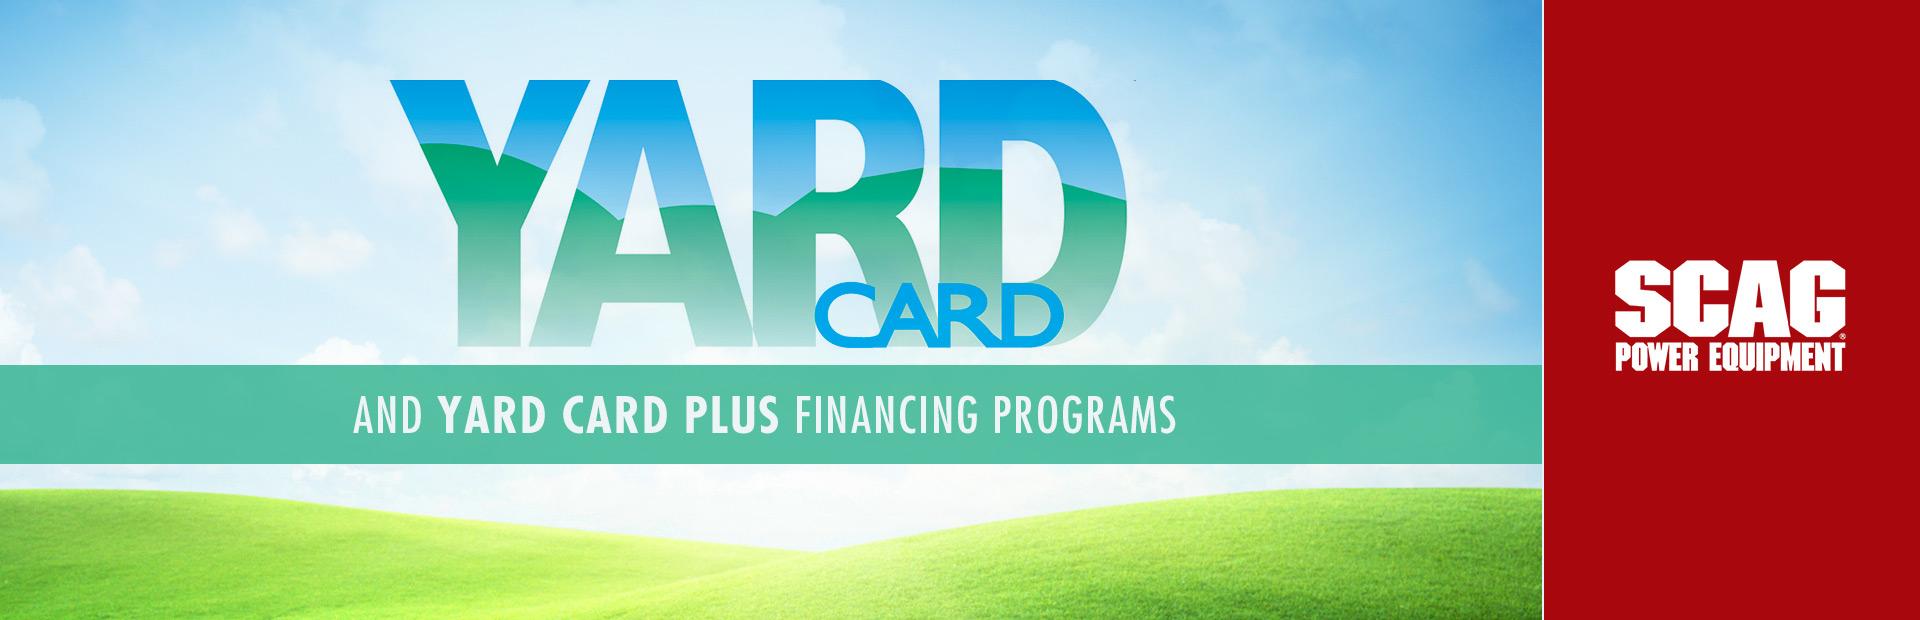 Yard Card And Yard Card Plus Financing Programs